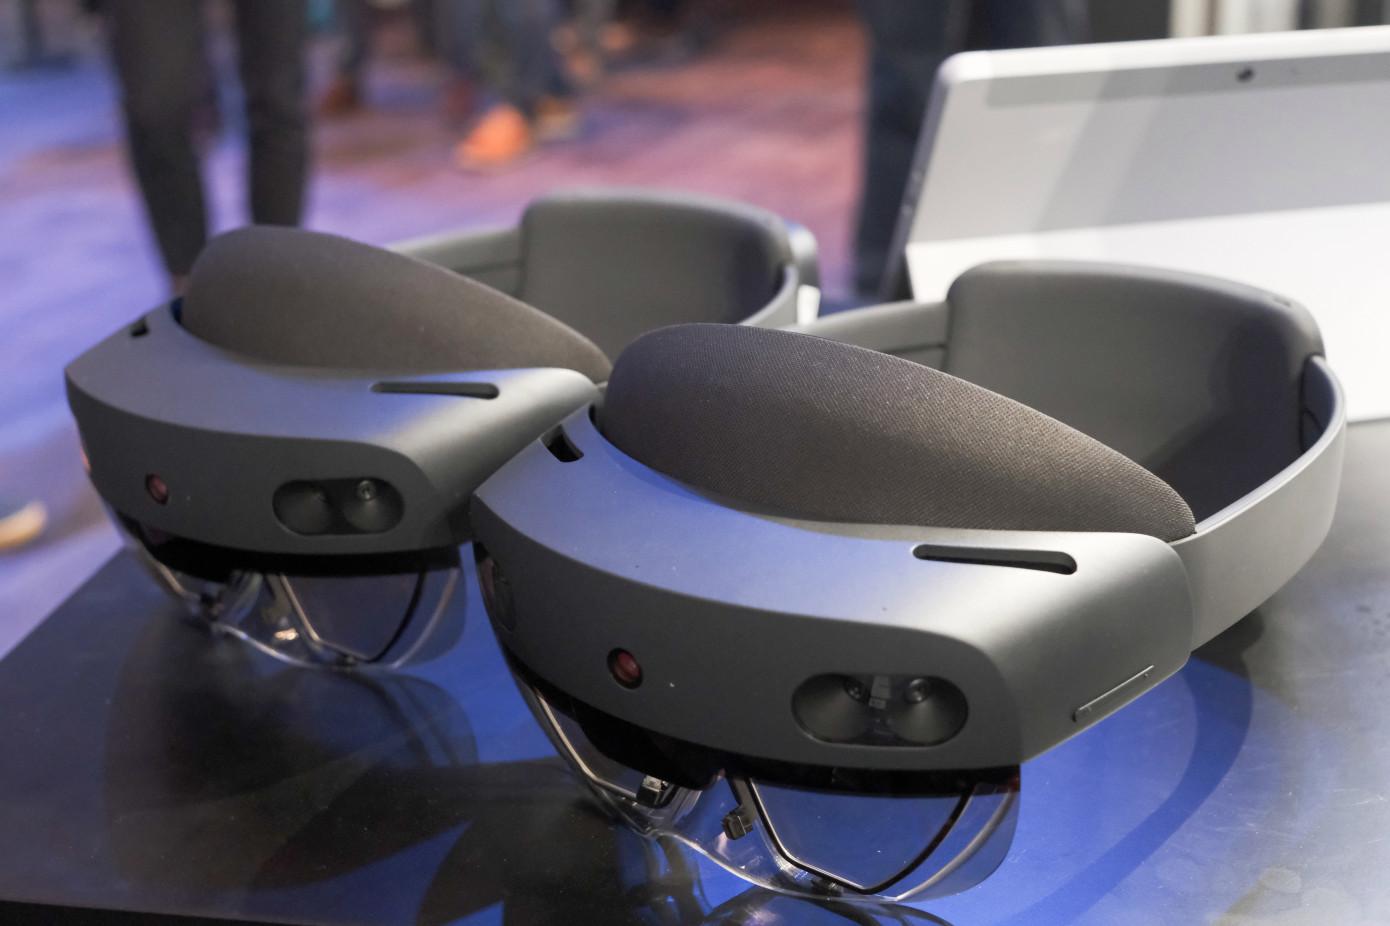 Unity宣布收购温哥华AR / VR技术服务公司Finger Food